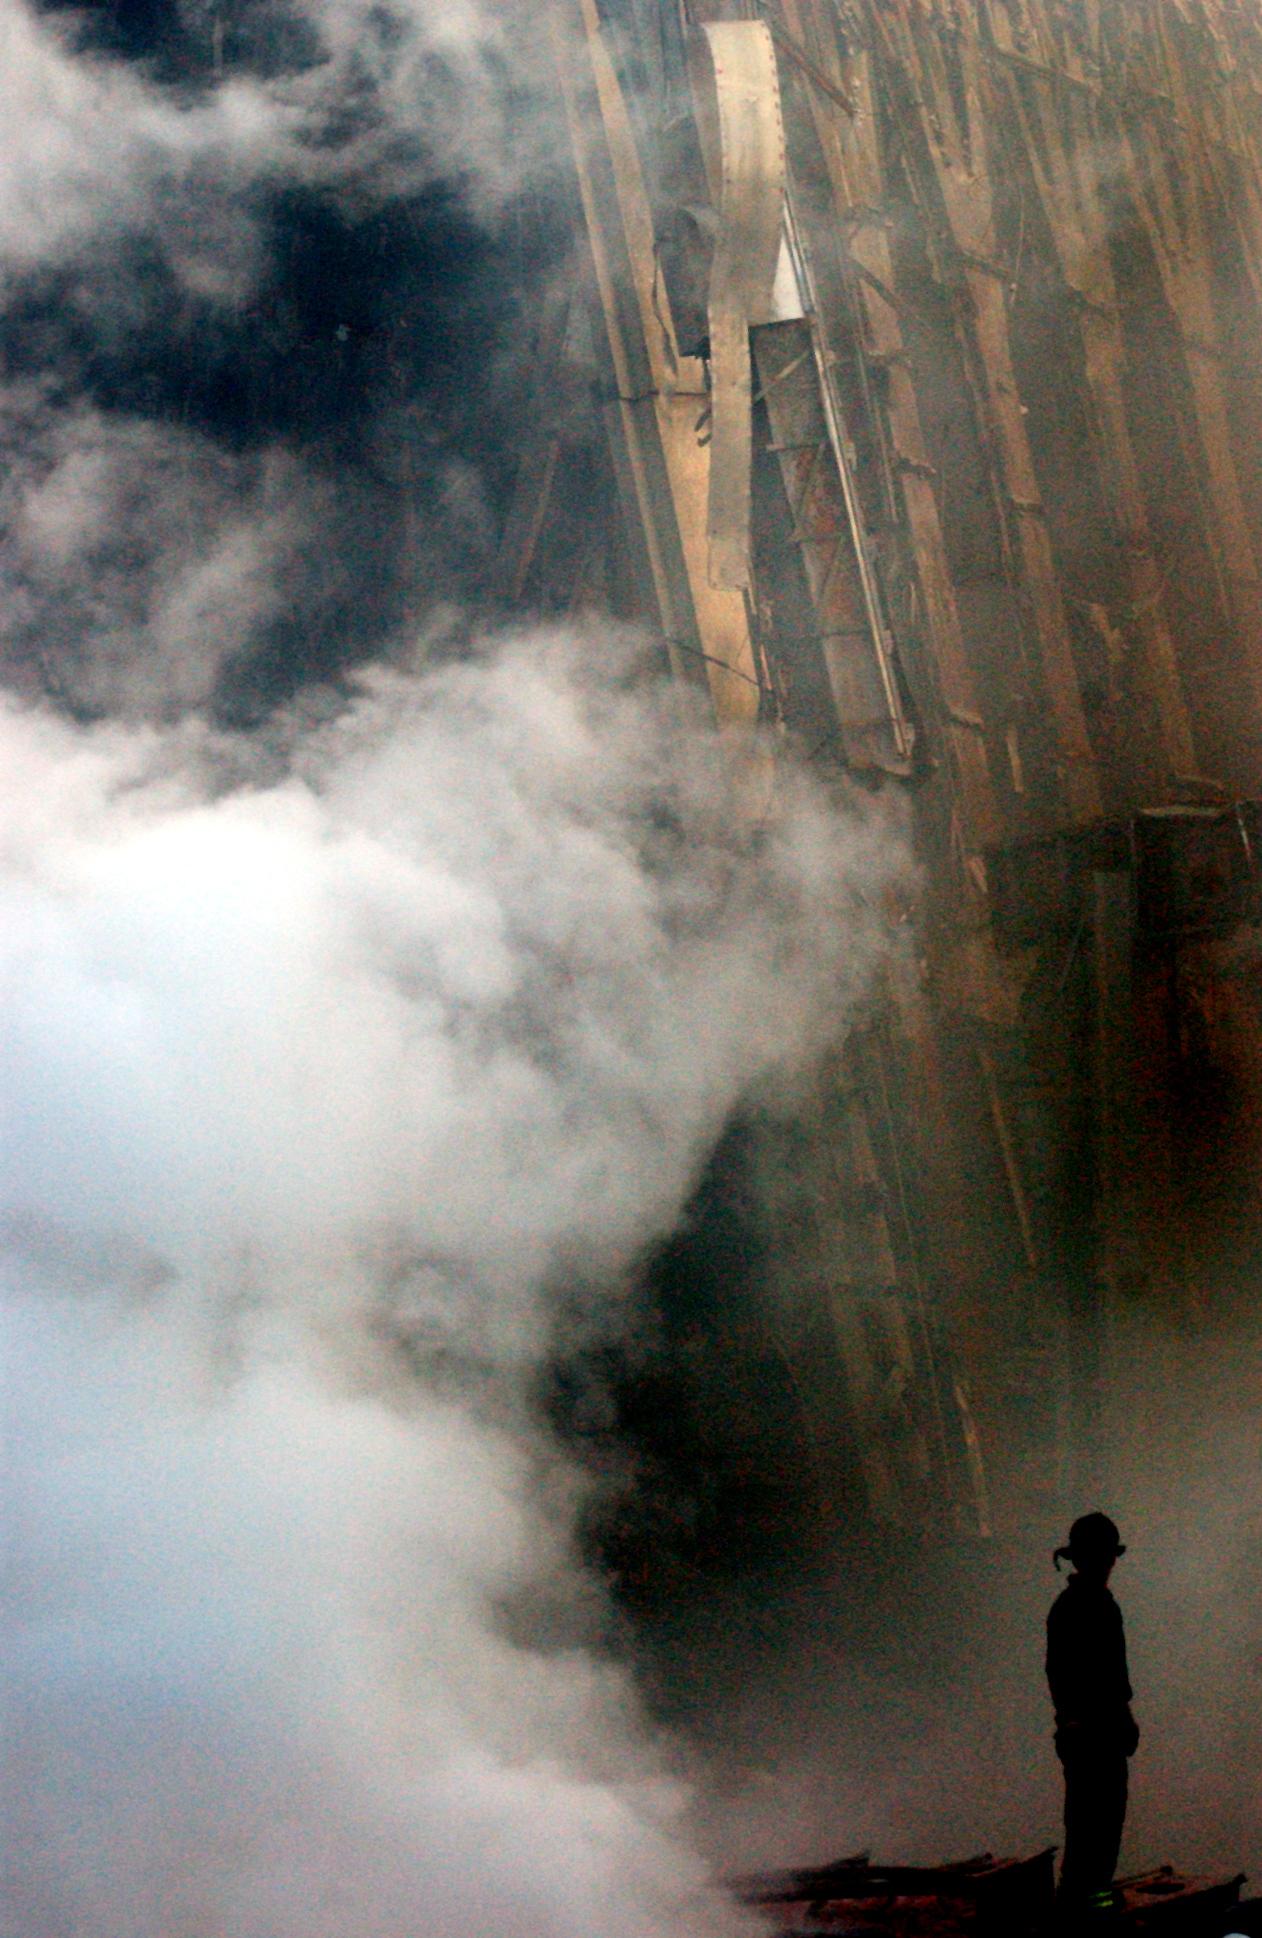 Ground 0 - Lone Firefighter